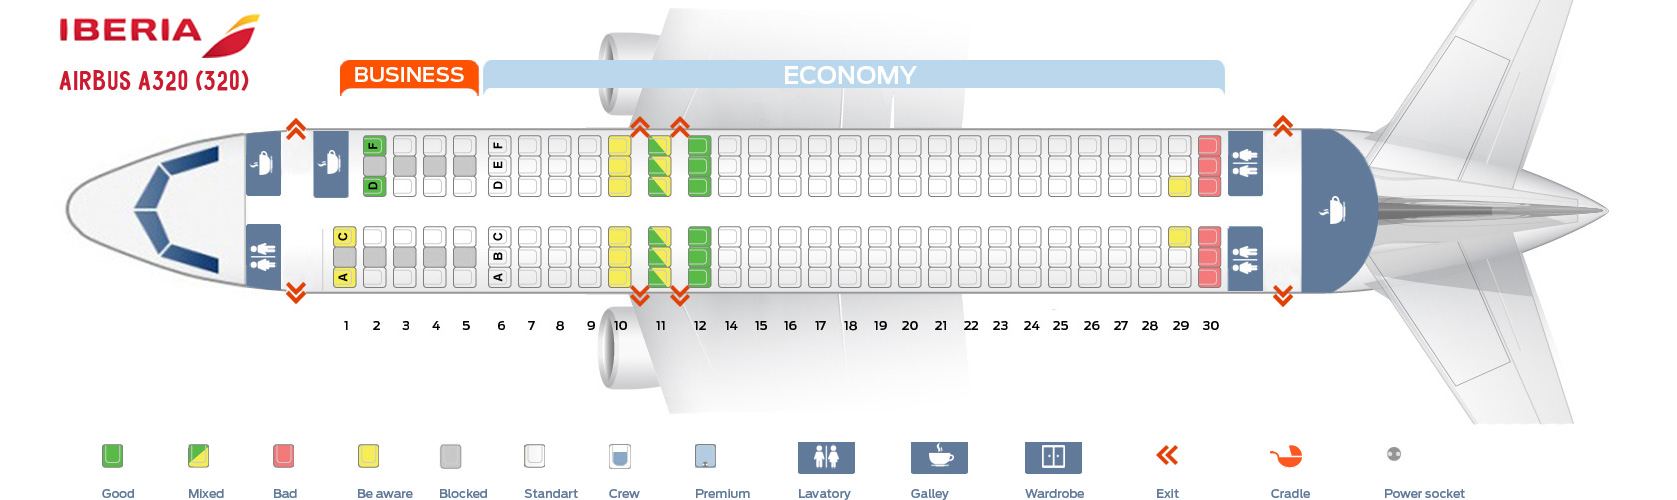 Seat Map Airbus A320-200 Iberia